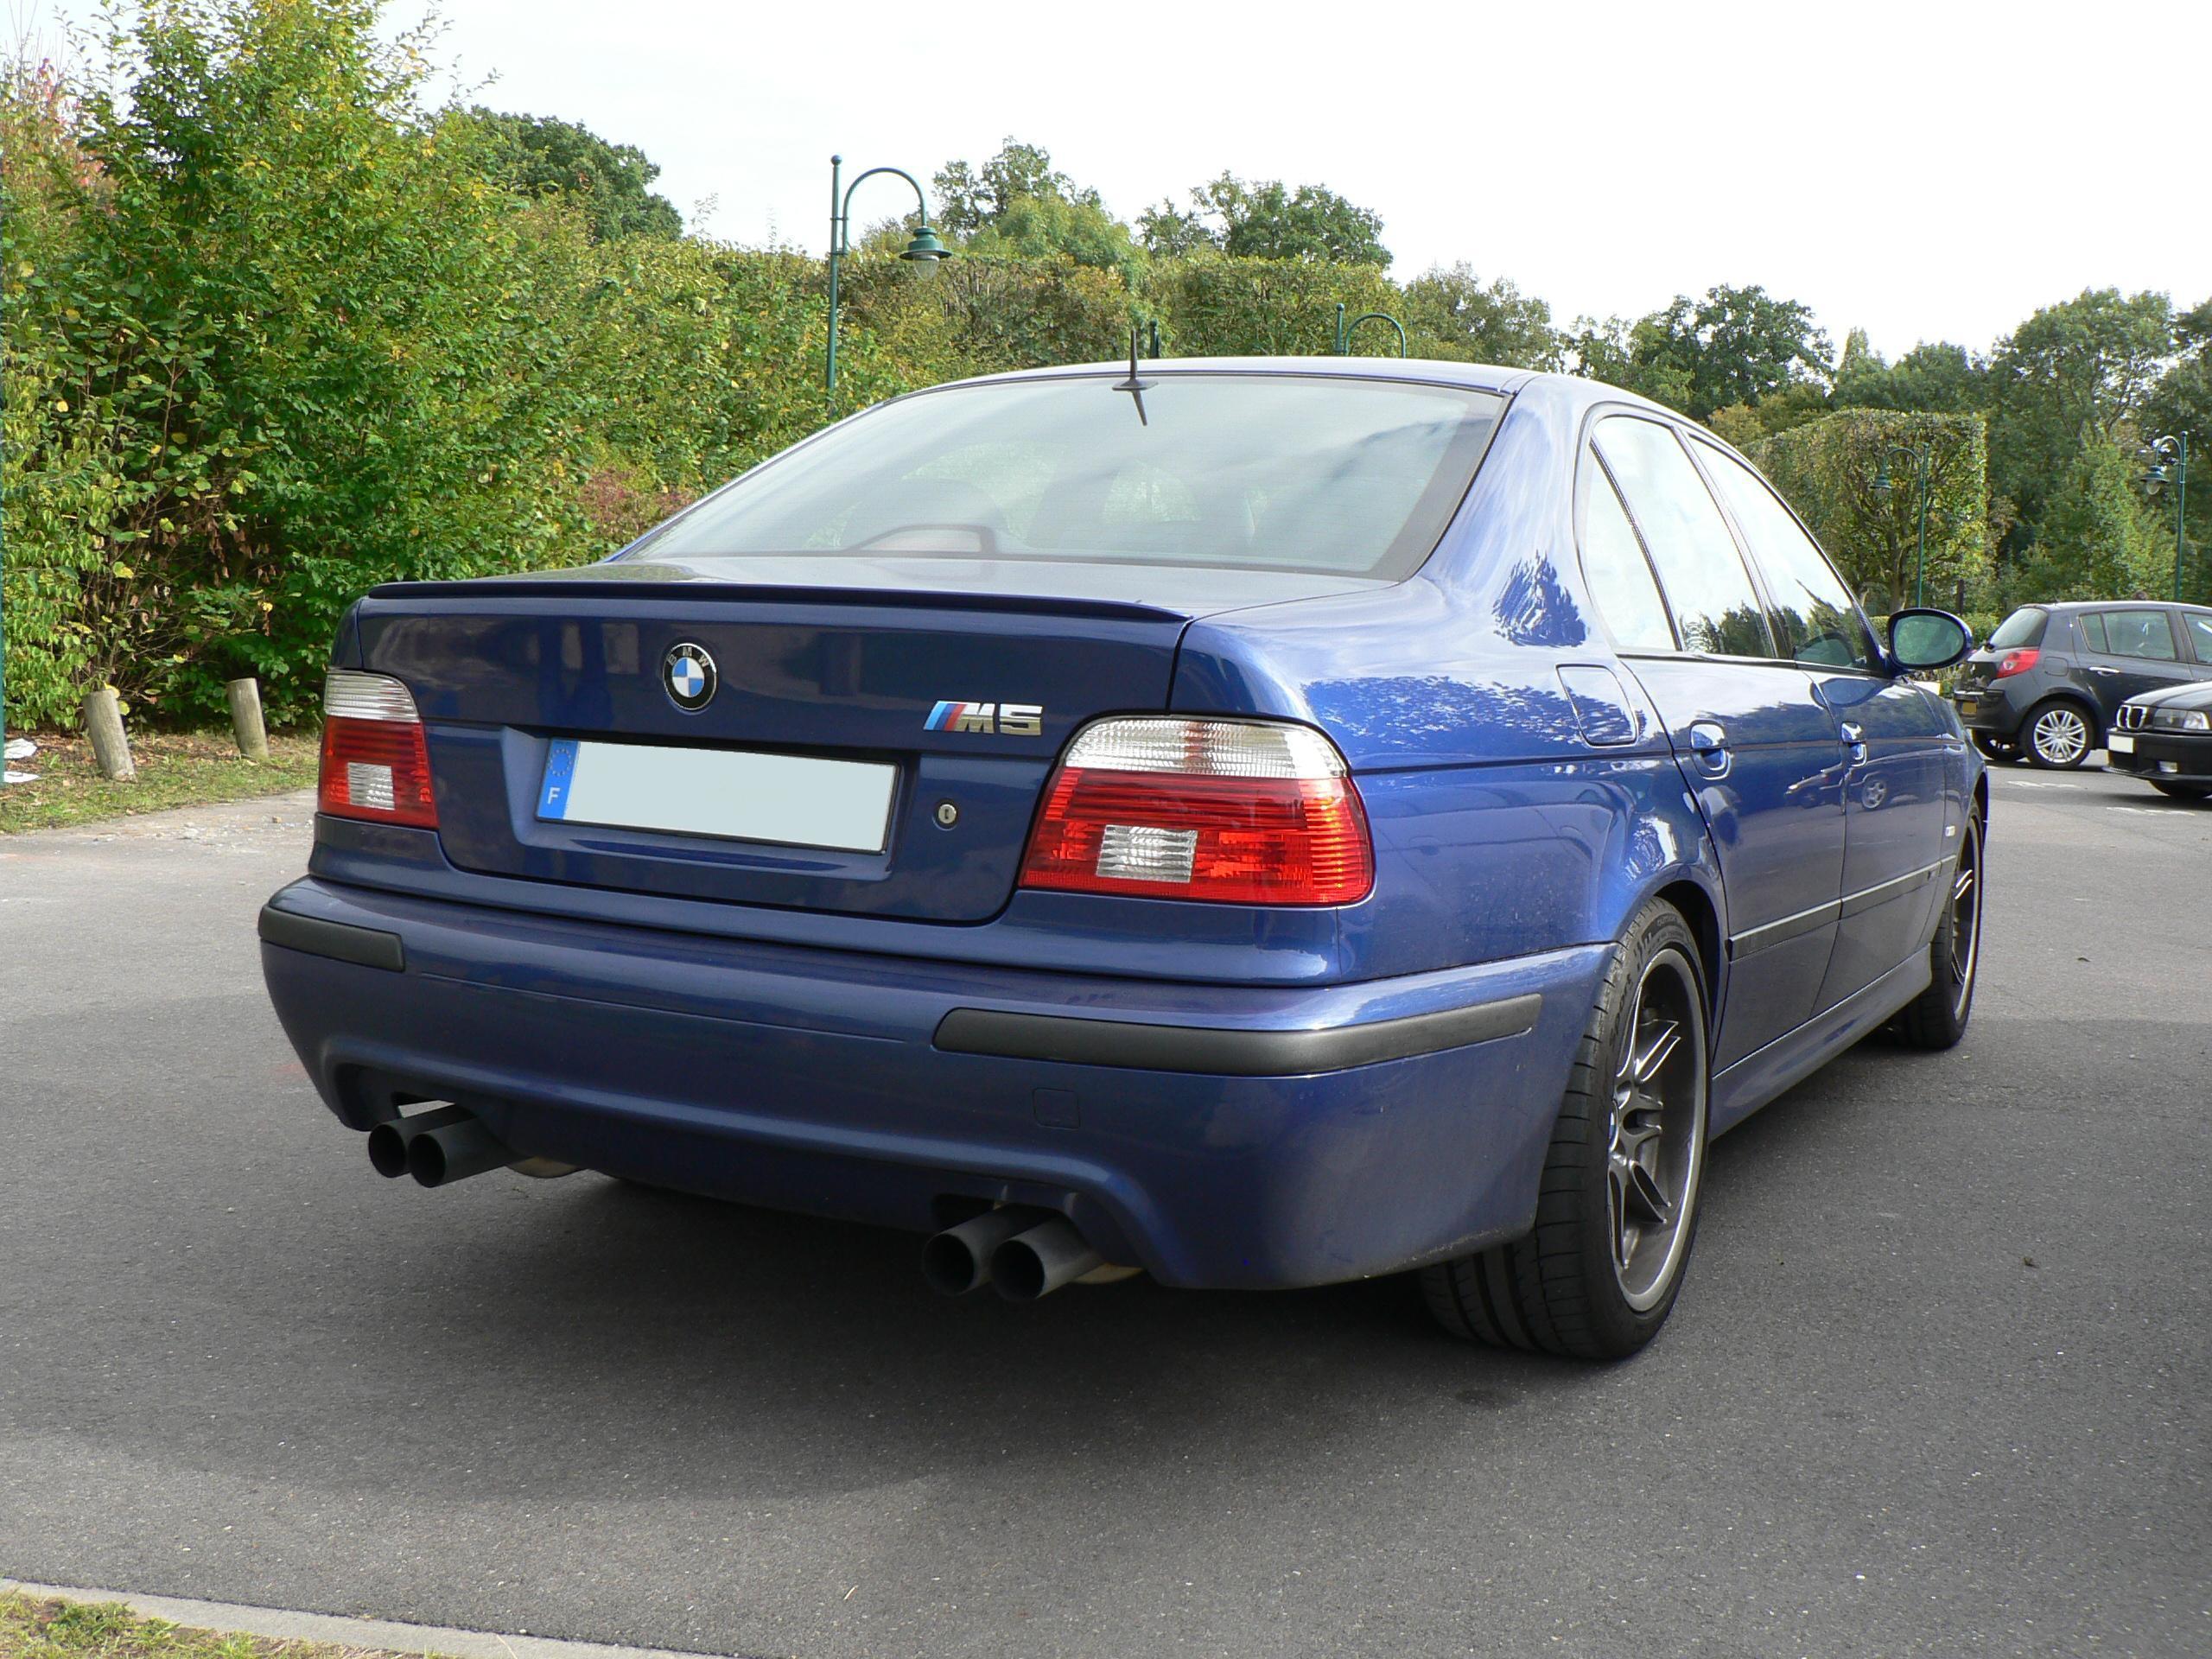 File:M5 E39 Rear.JPG